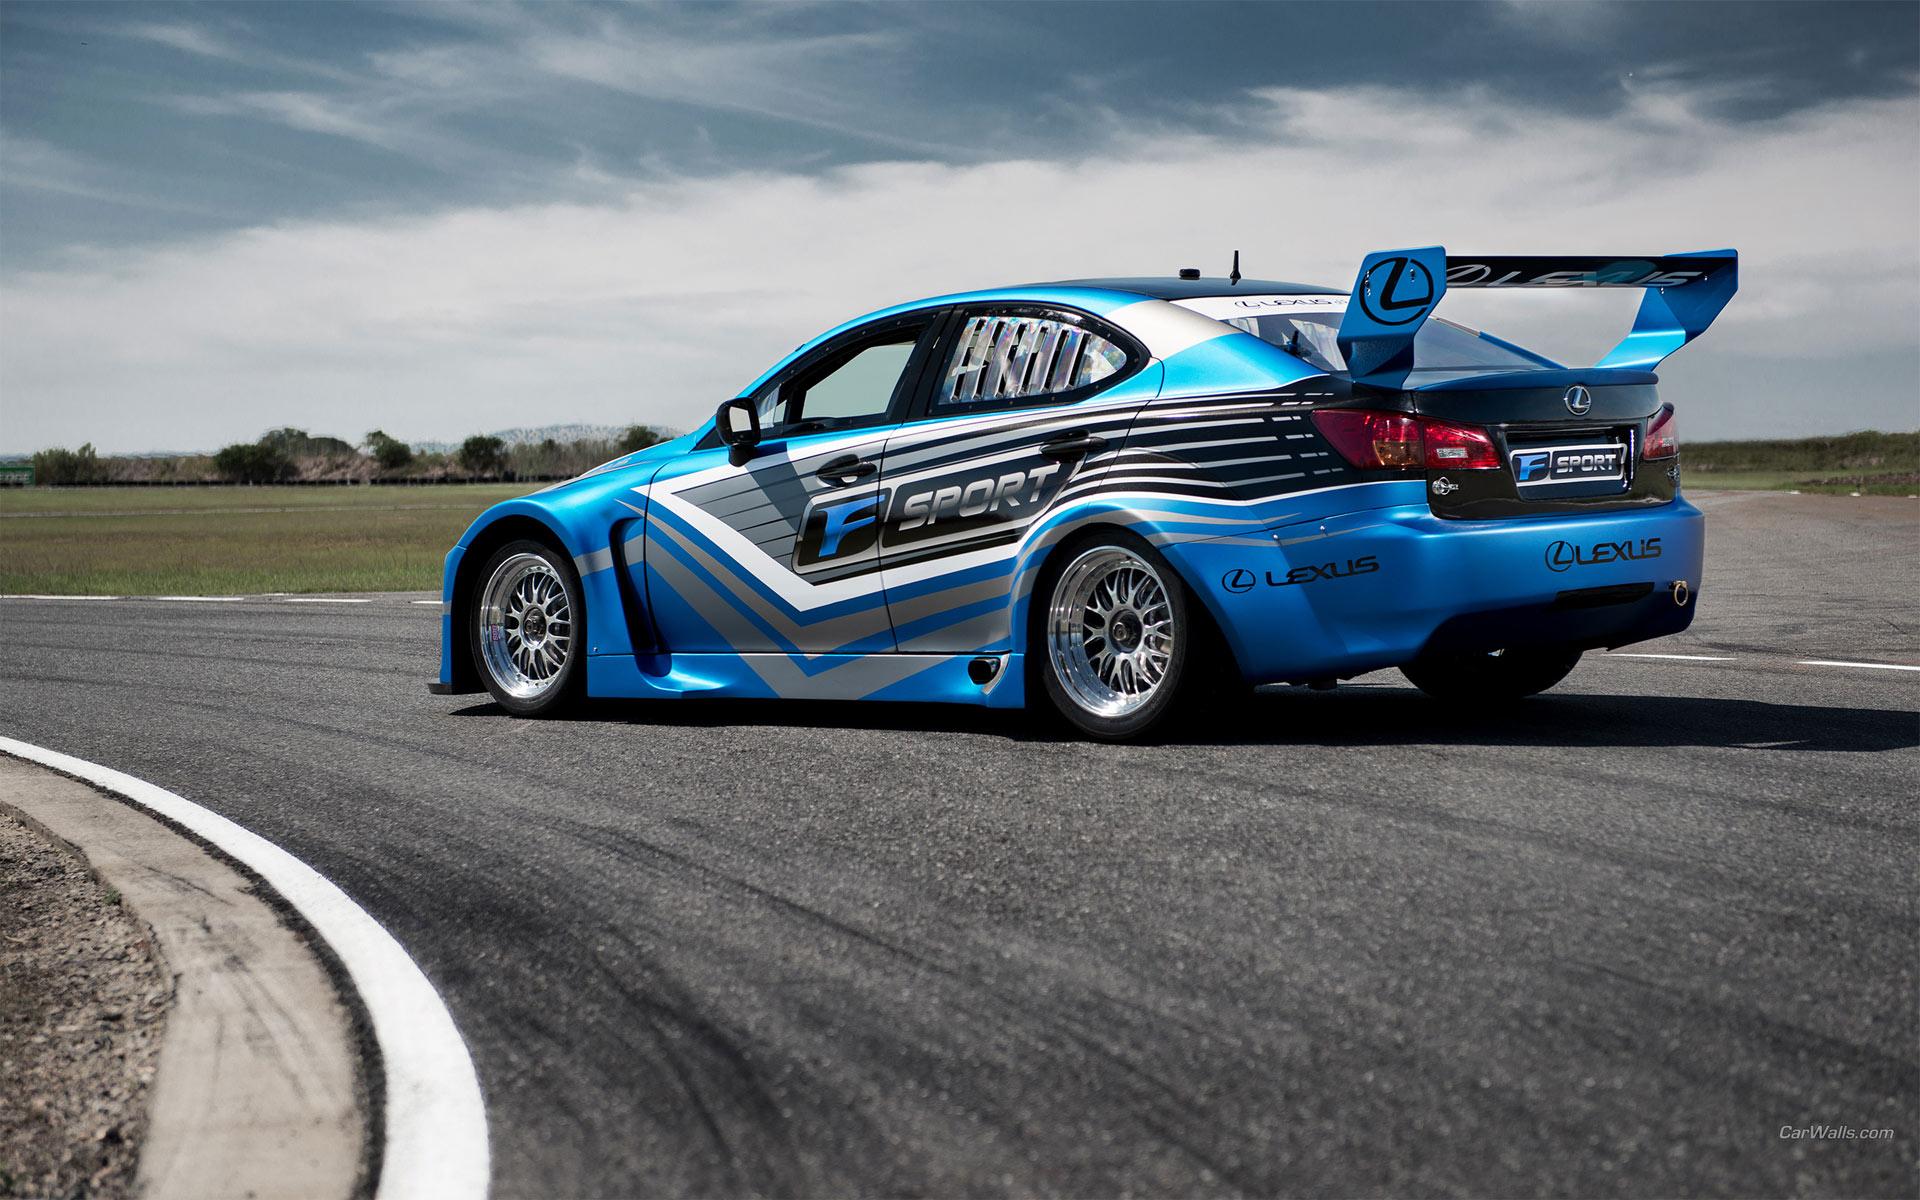 Lexus Is F V8 Superstar International Series Tuning Race Car Racing Track Roads Wallpaper 1920x1200 31373 Wallpaperup